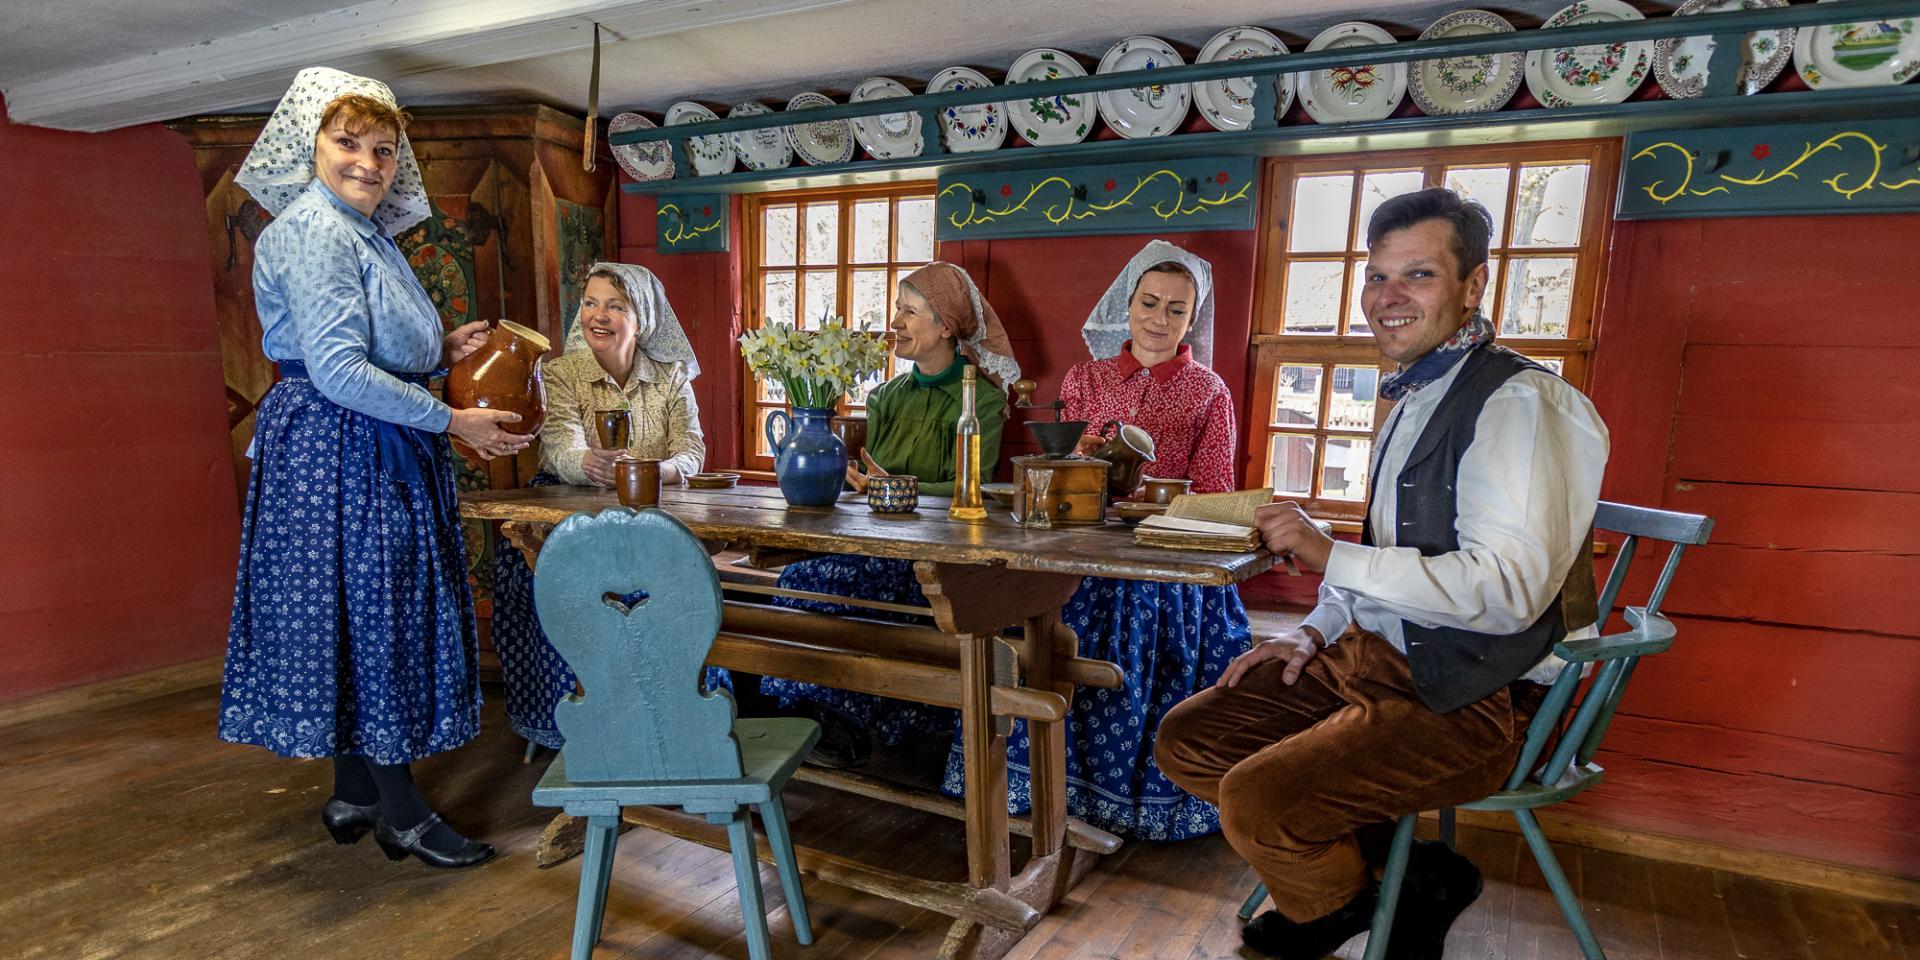 Freilandmuseum Lehde, Hof aus Lehde, Wohnstallhaus  Foto: Mario Koch Fotografie